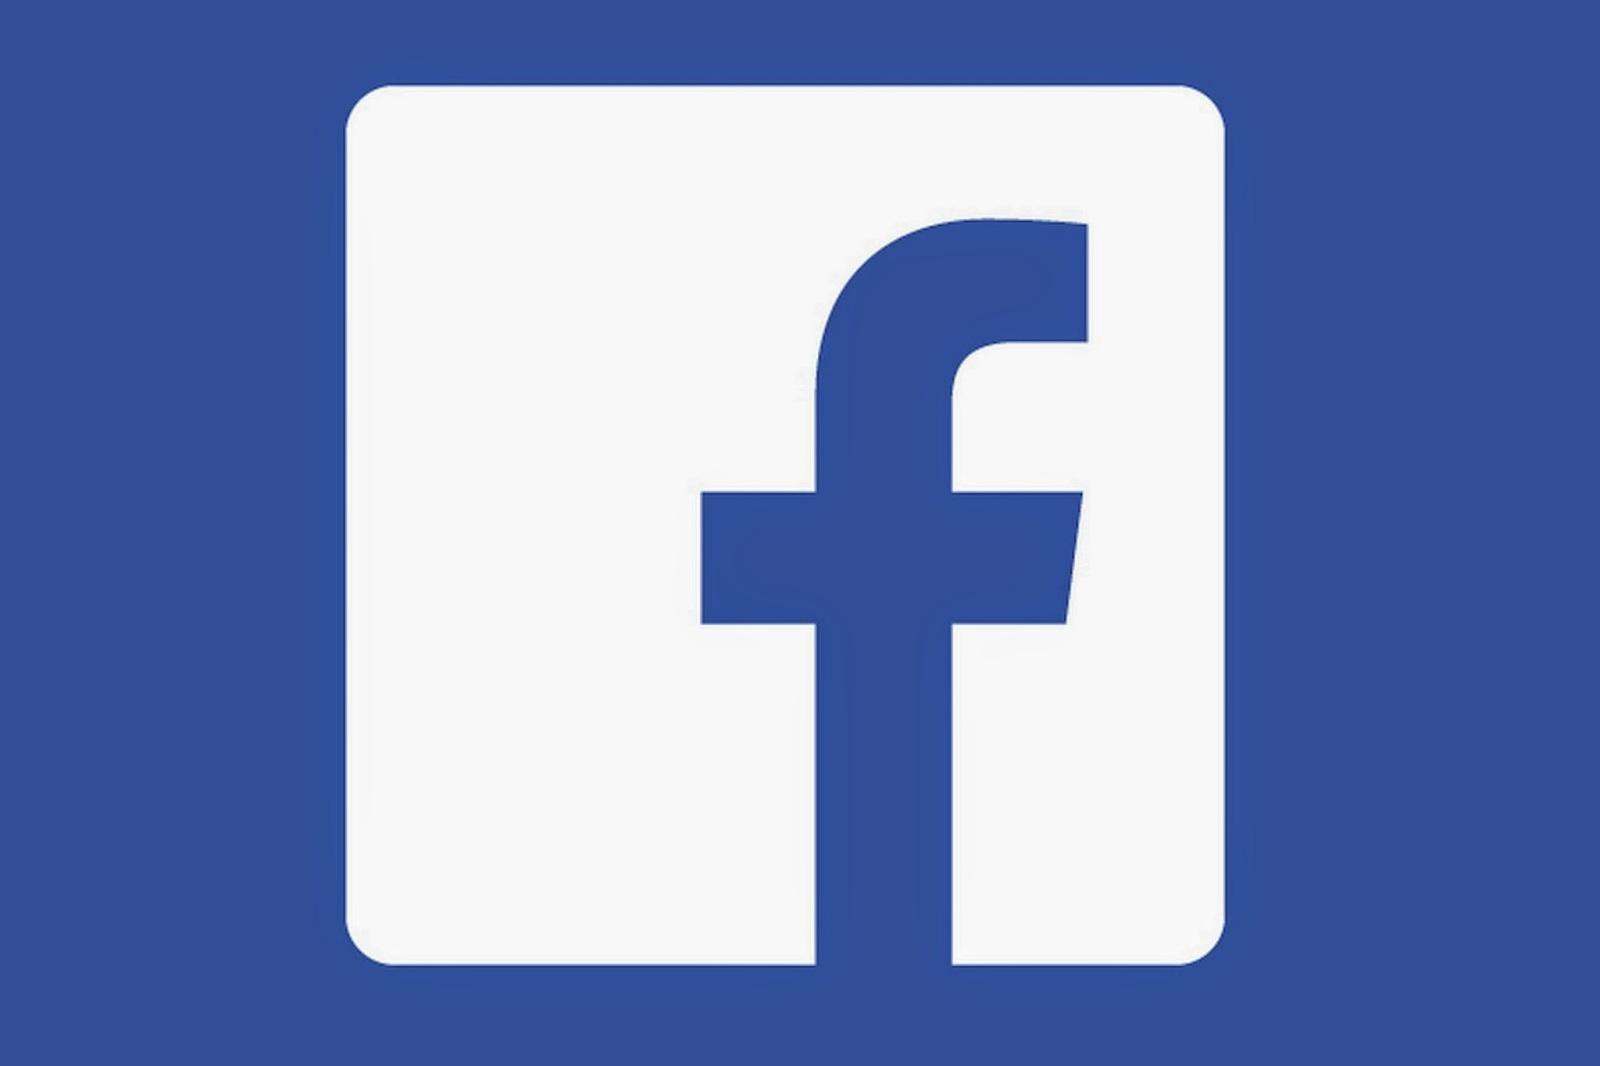 Facebook Logo Ai Download - ClipArt Best